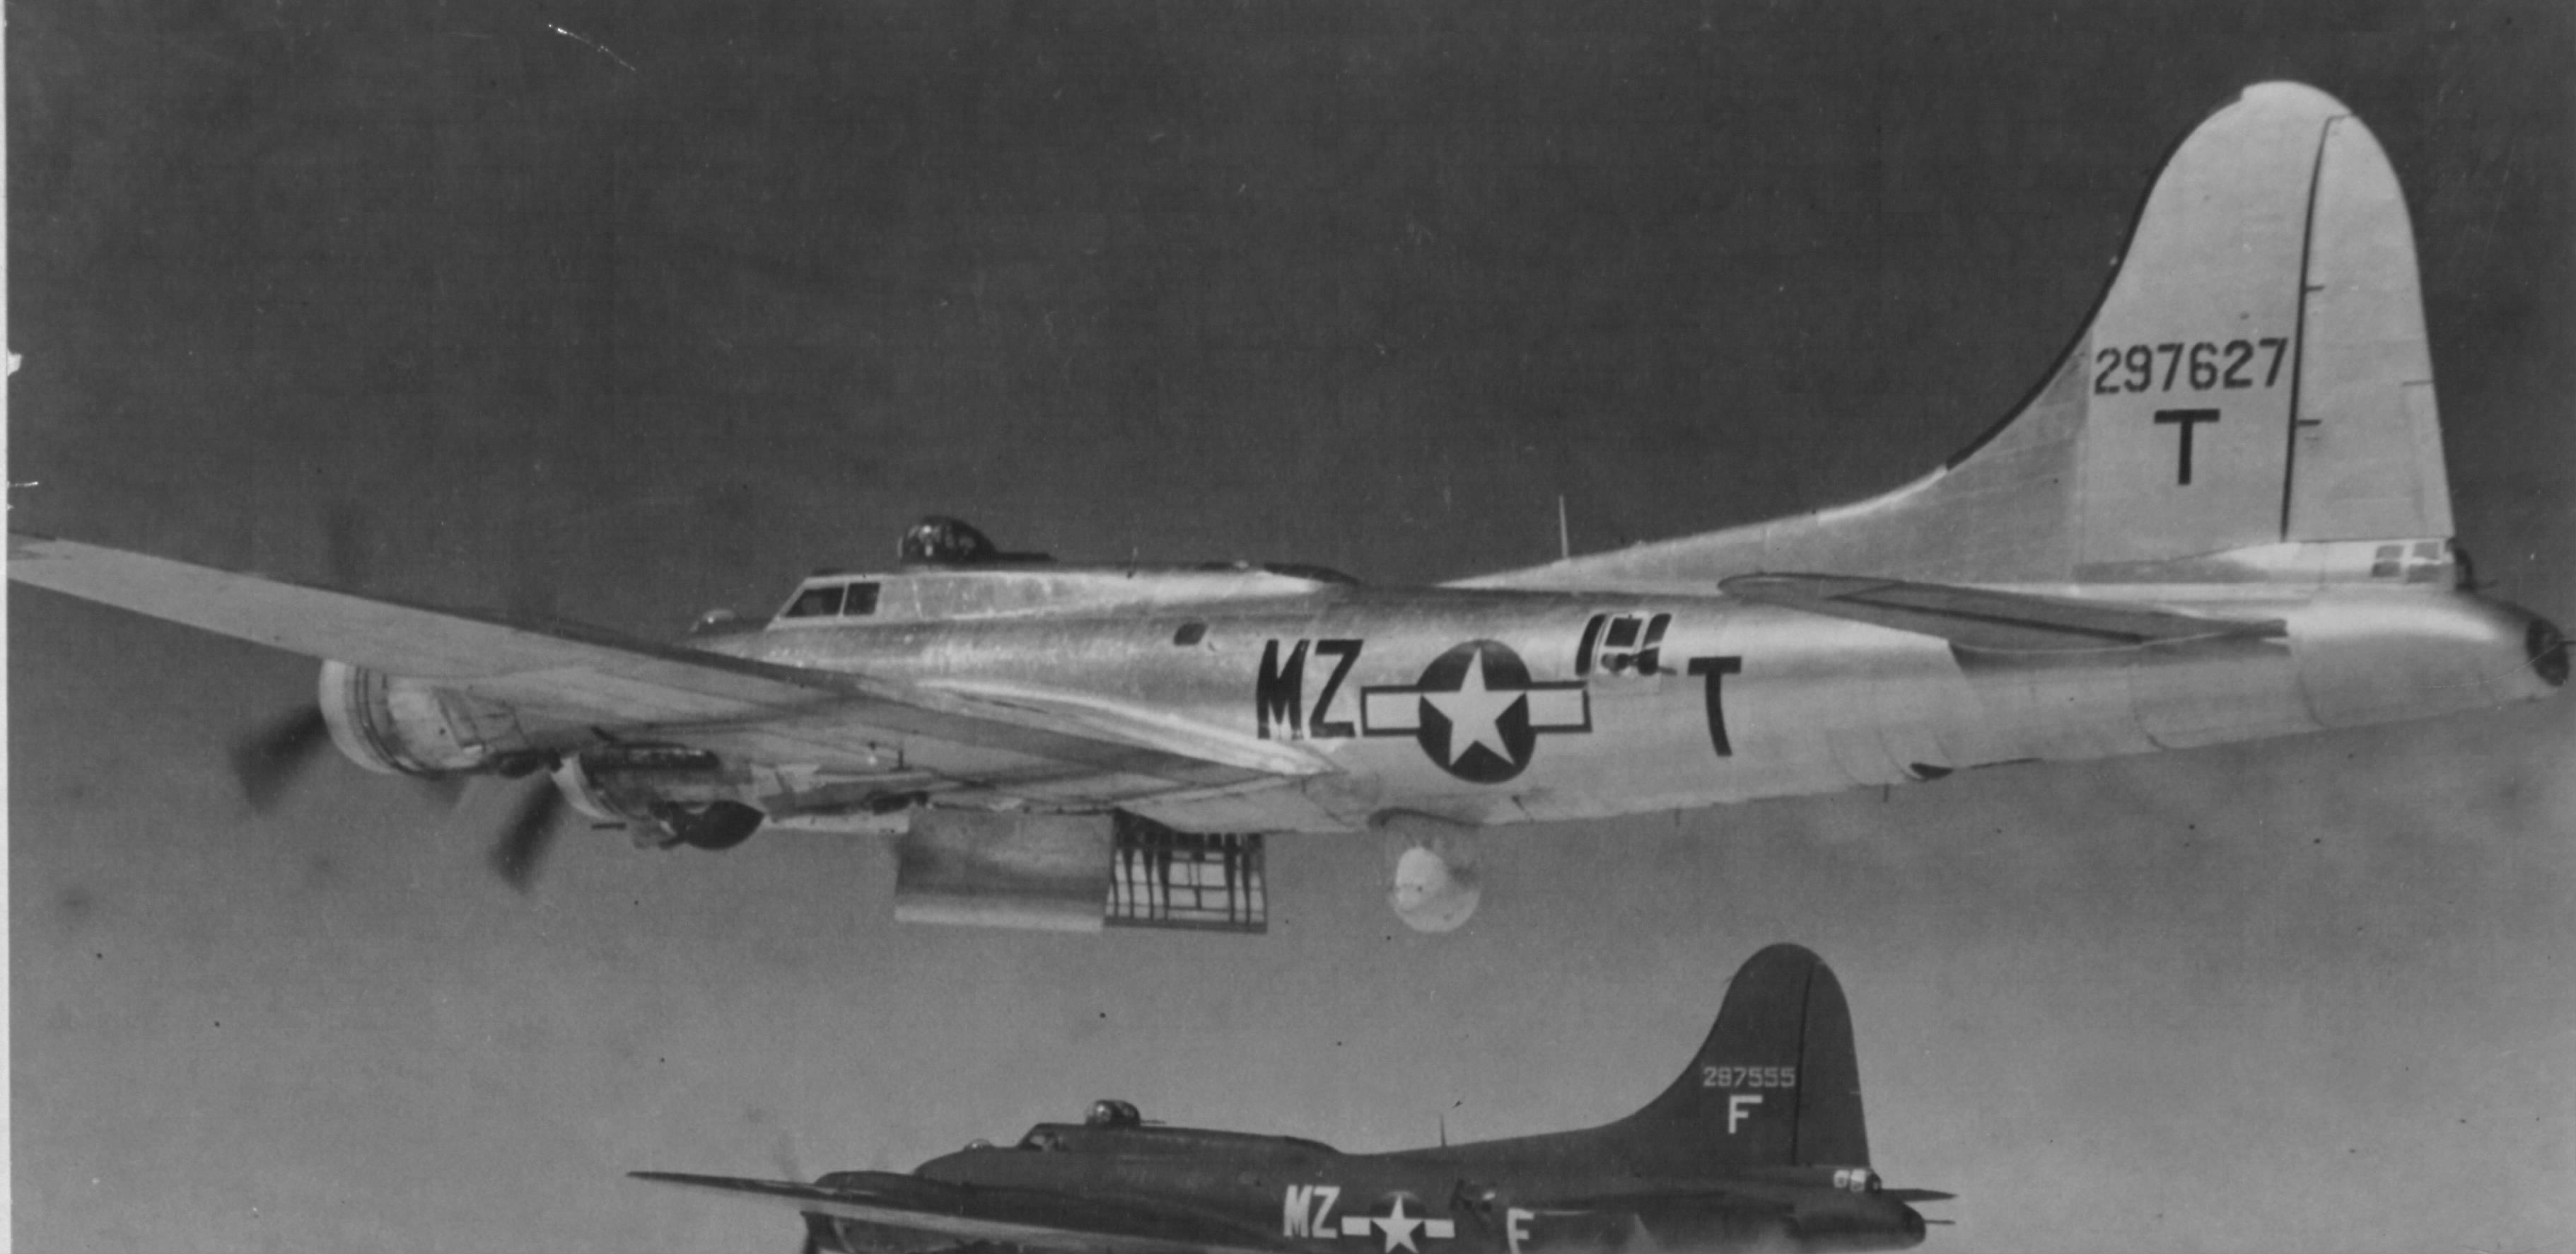 B-17 #42-97627 / Amen